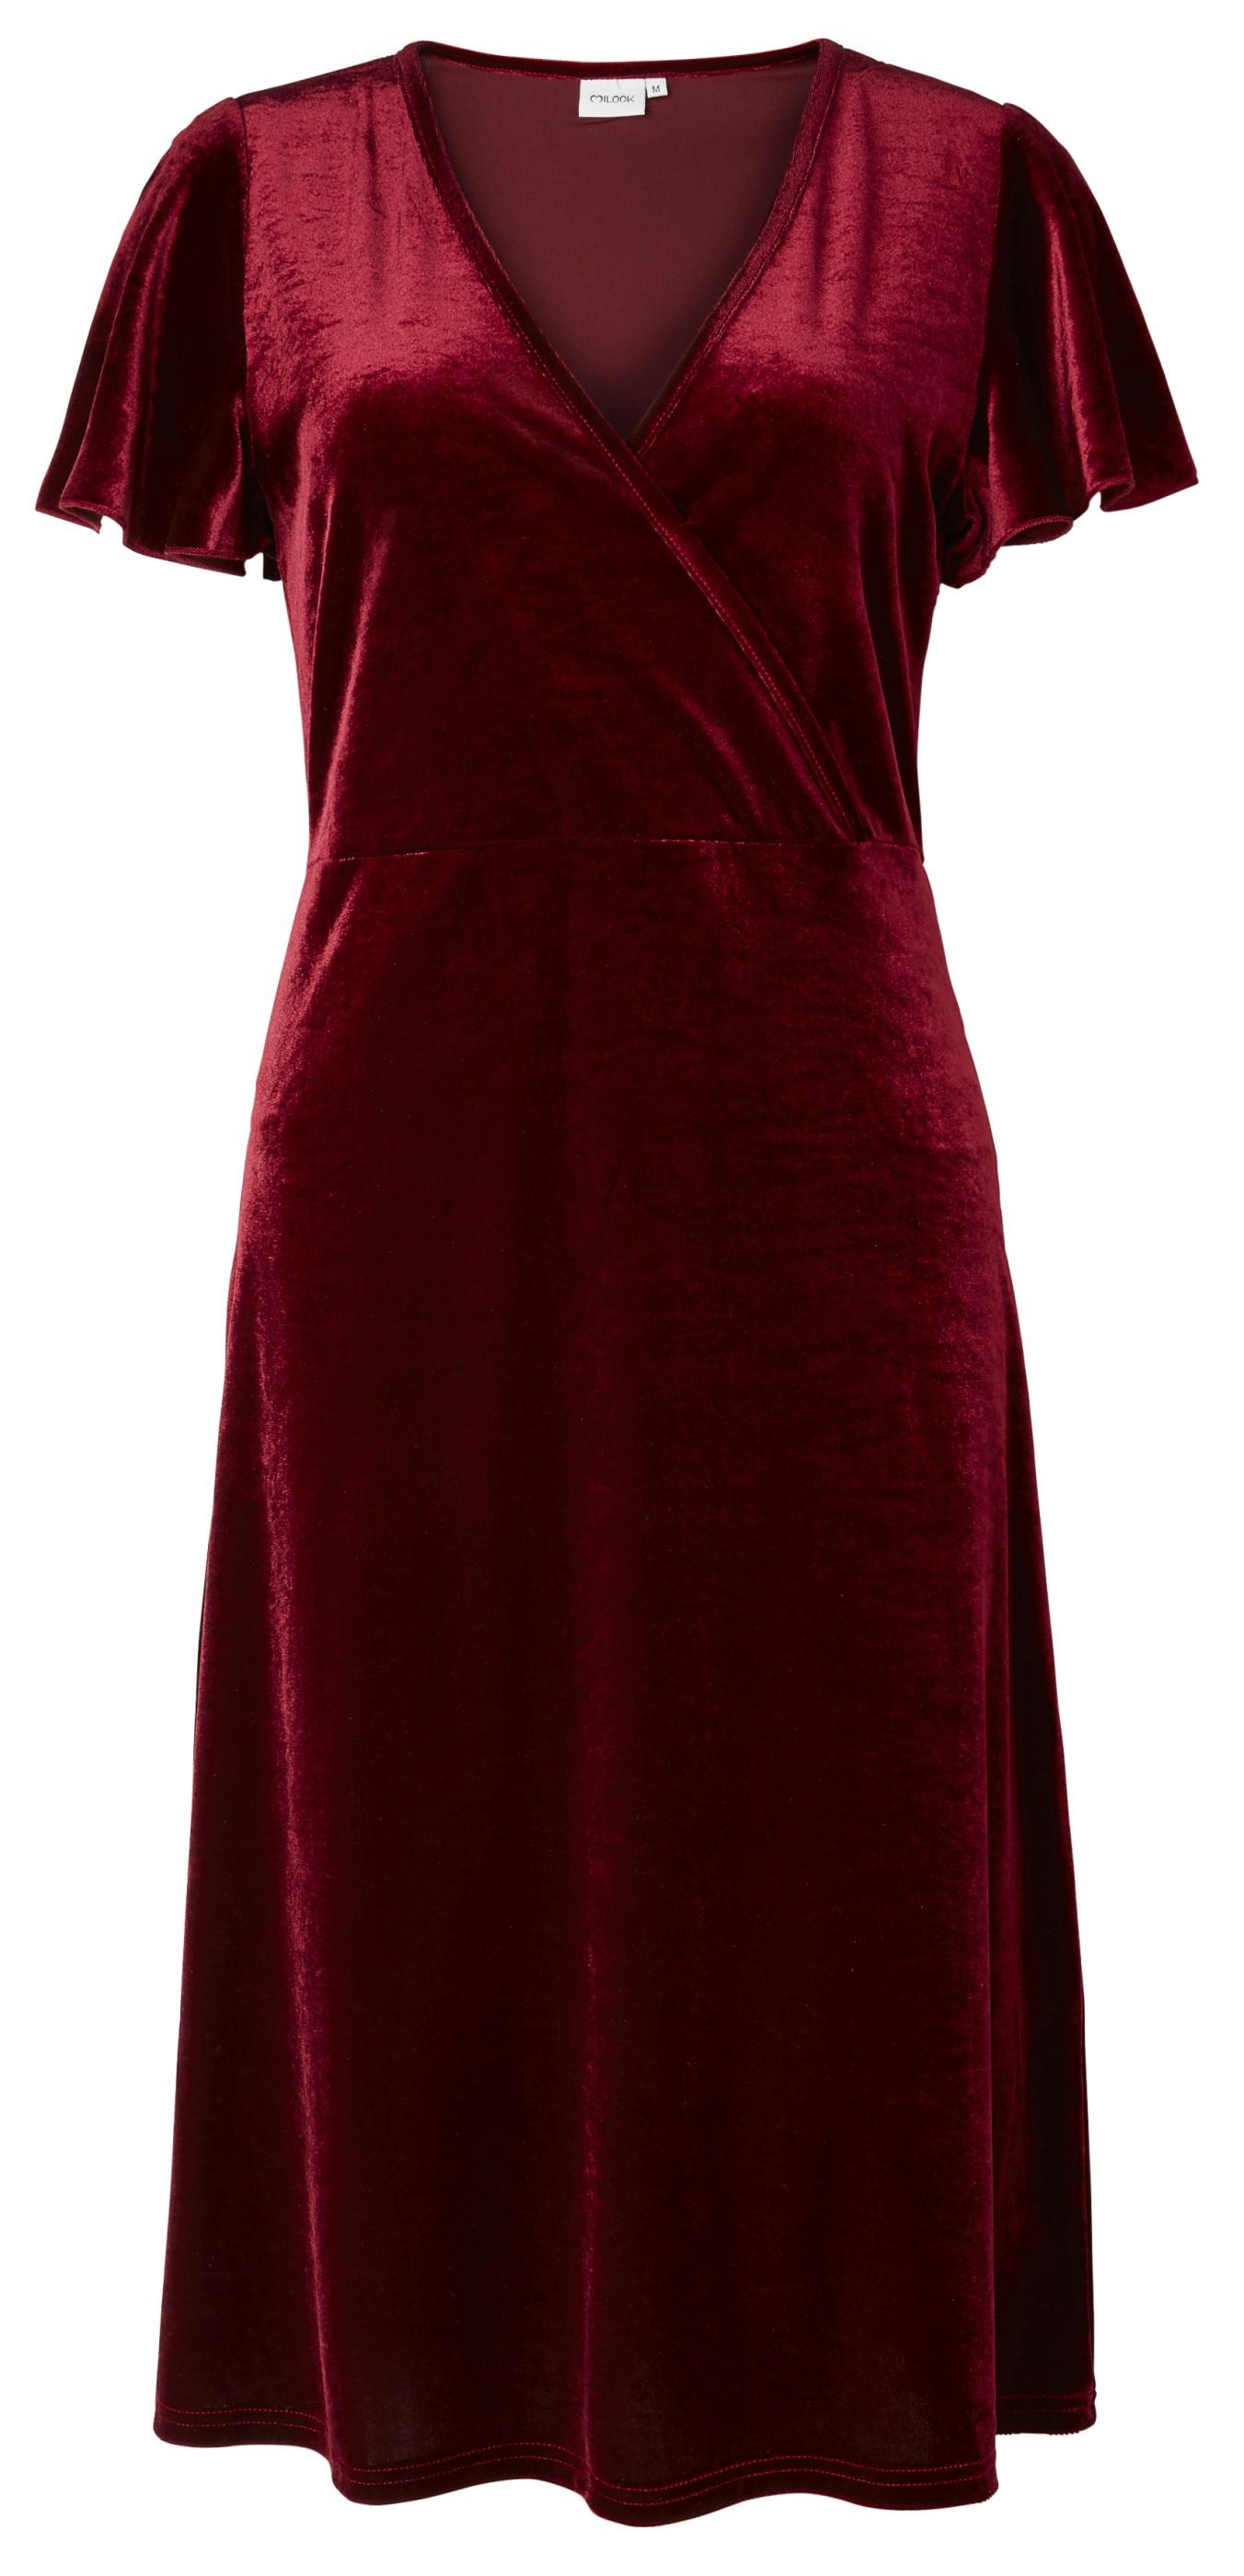 Sofia_dress_aubergine_FH_F